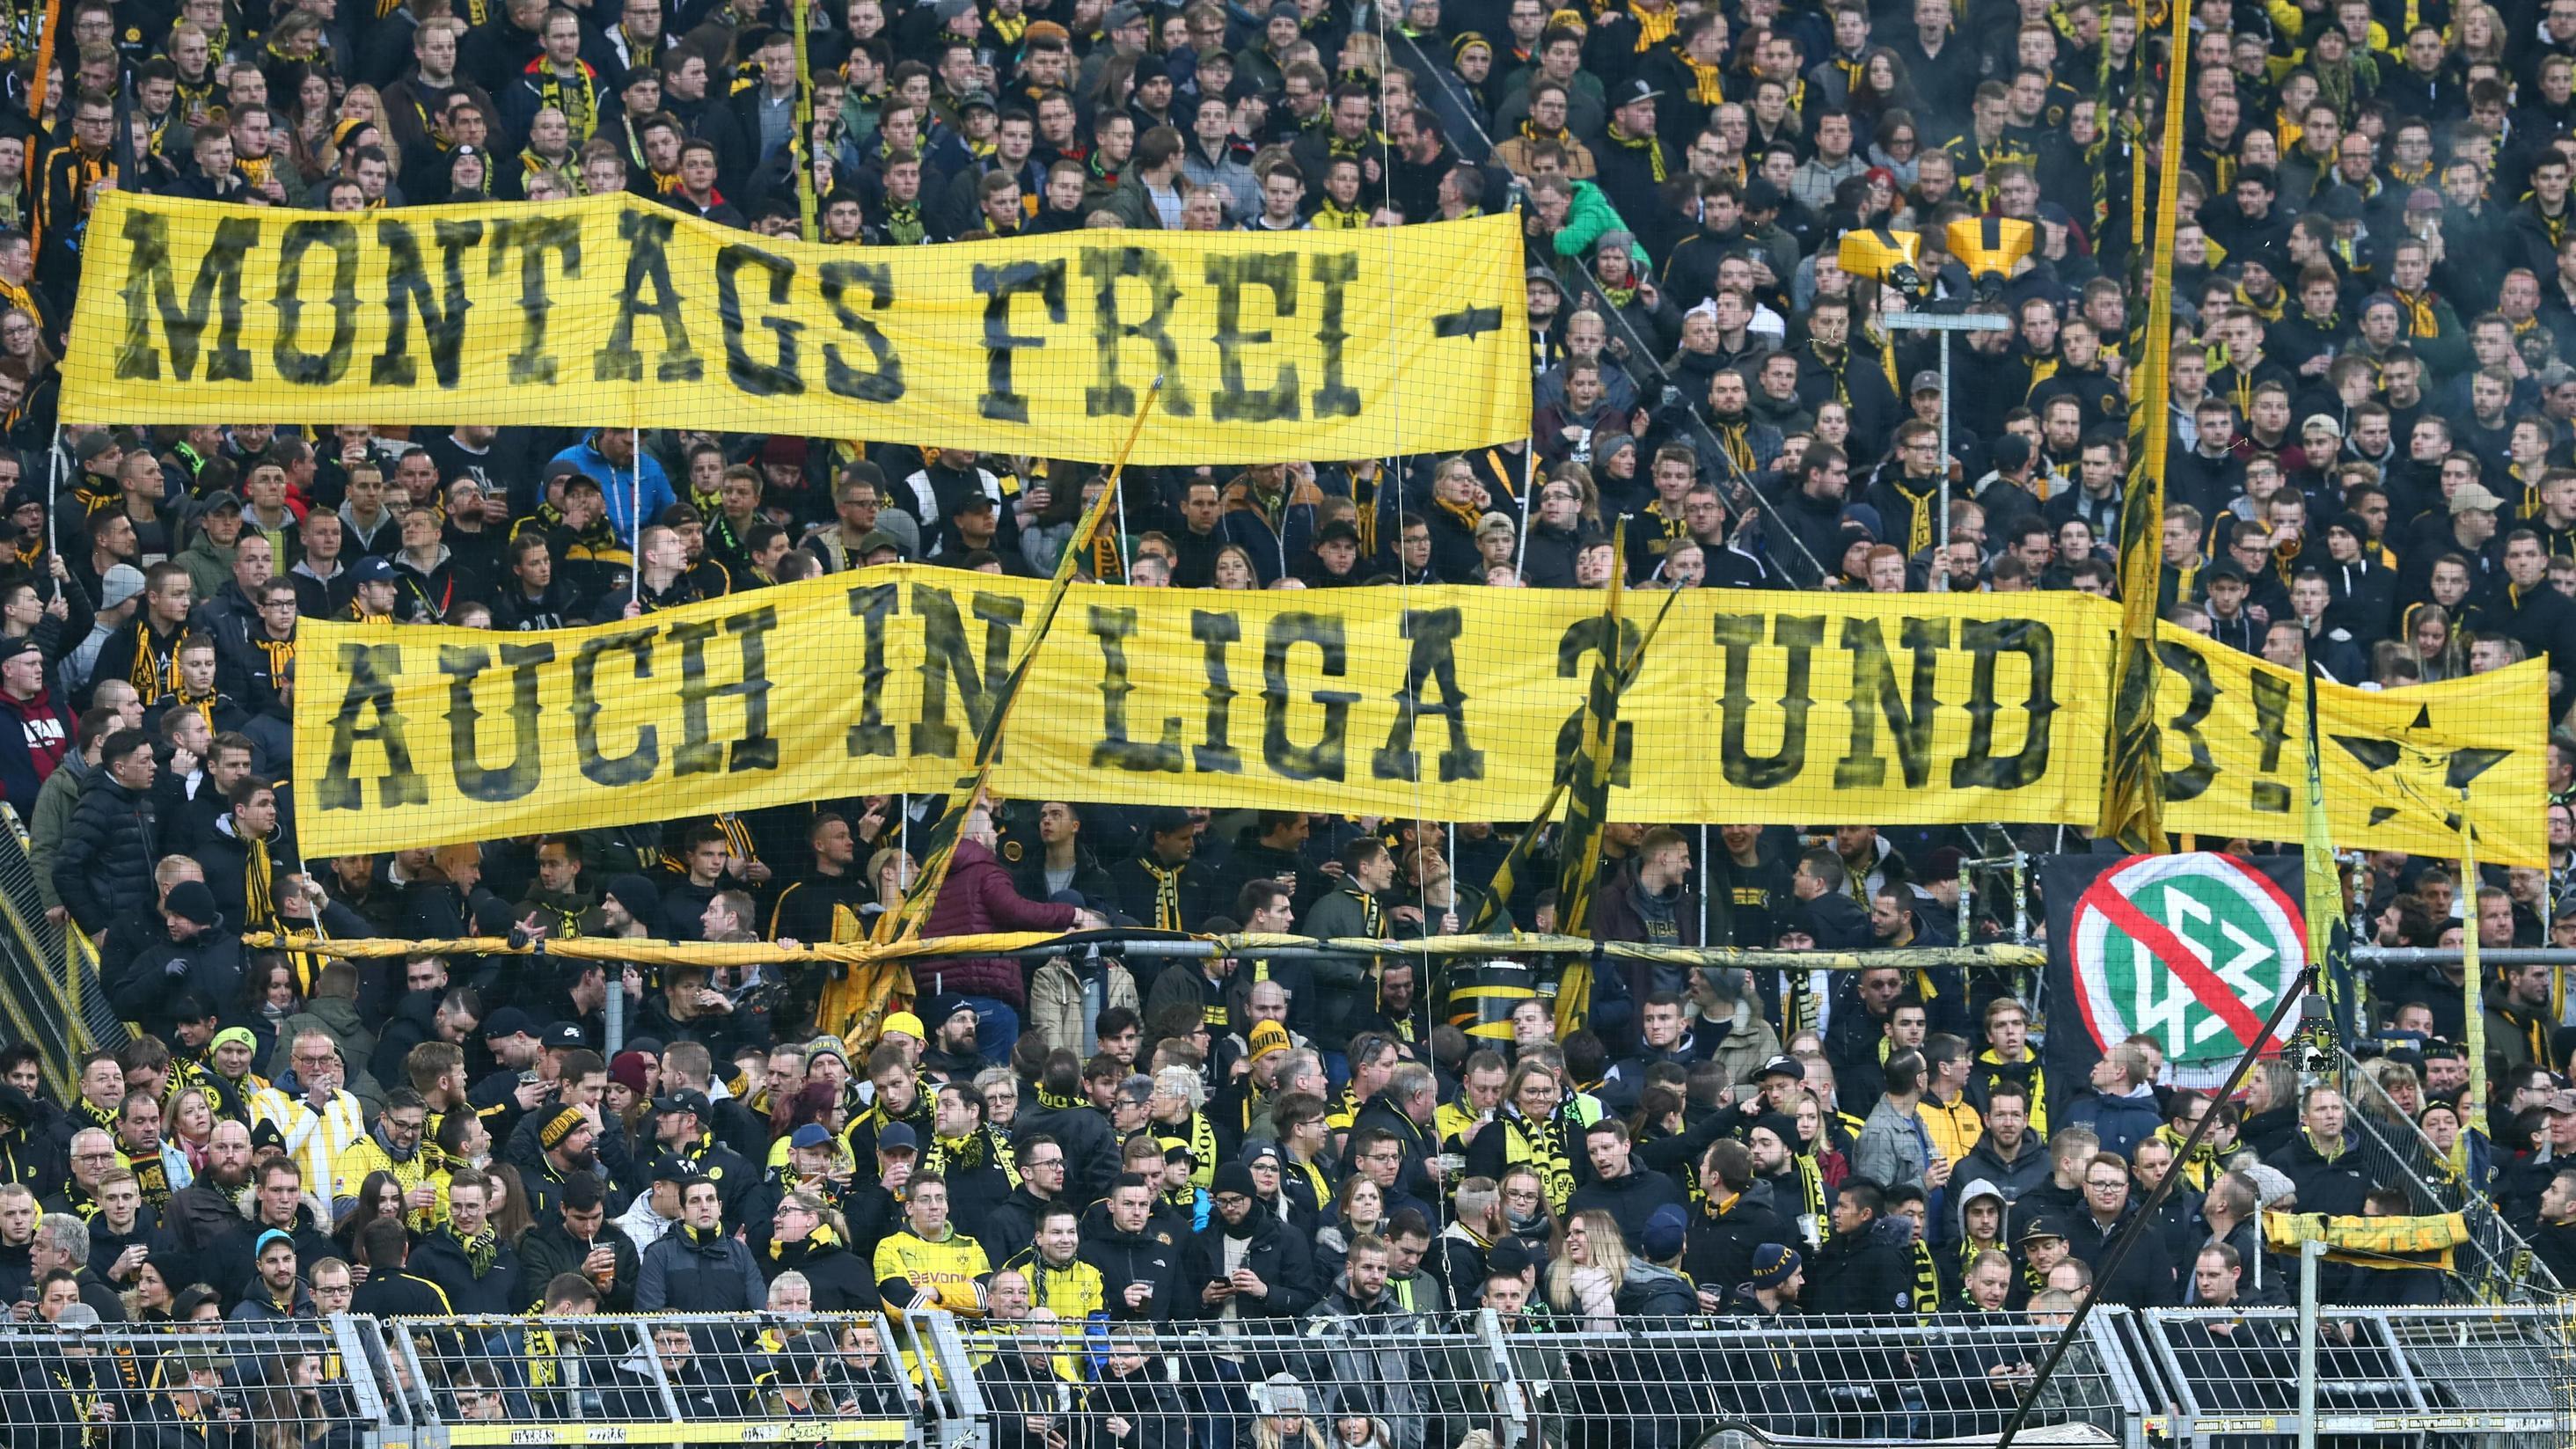 Montagsspiele 2. Bundesliga